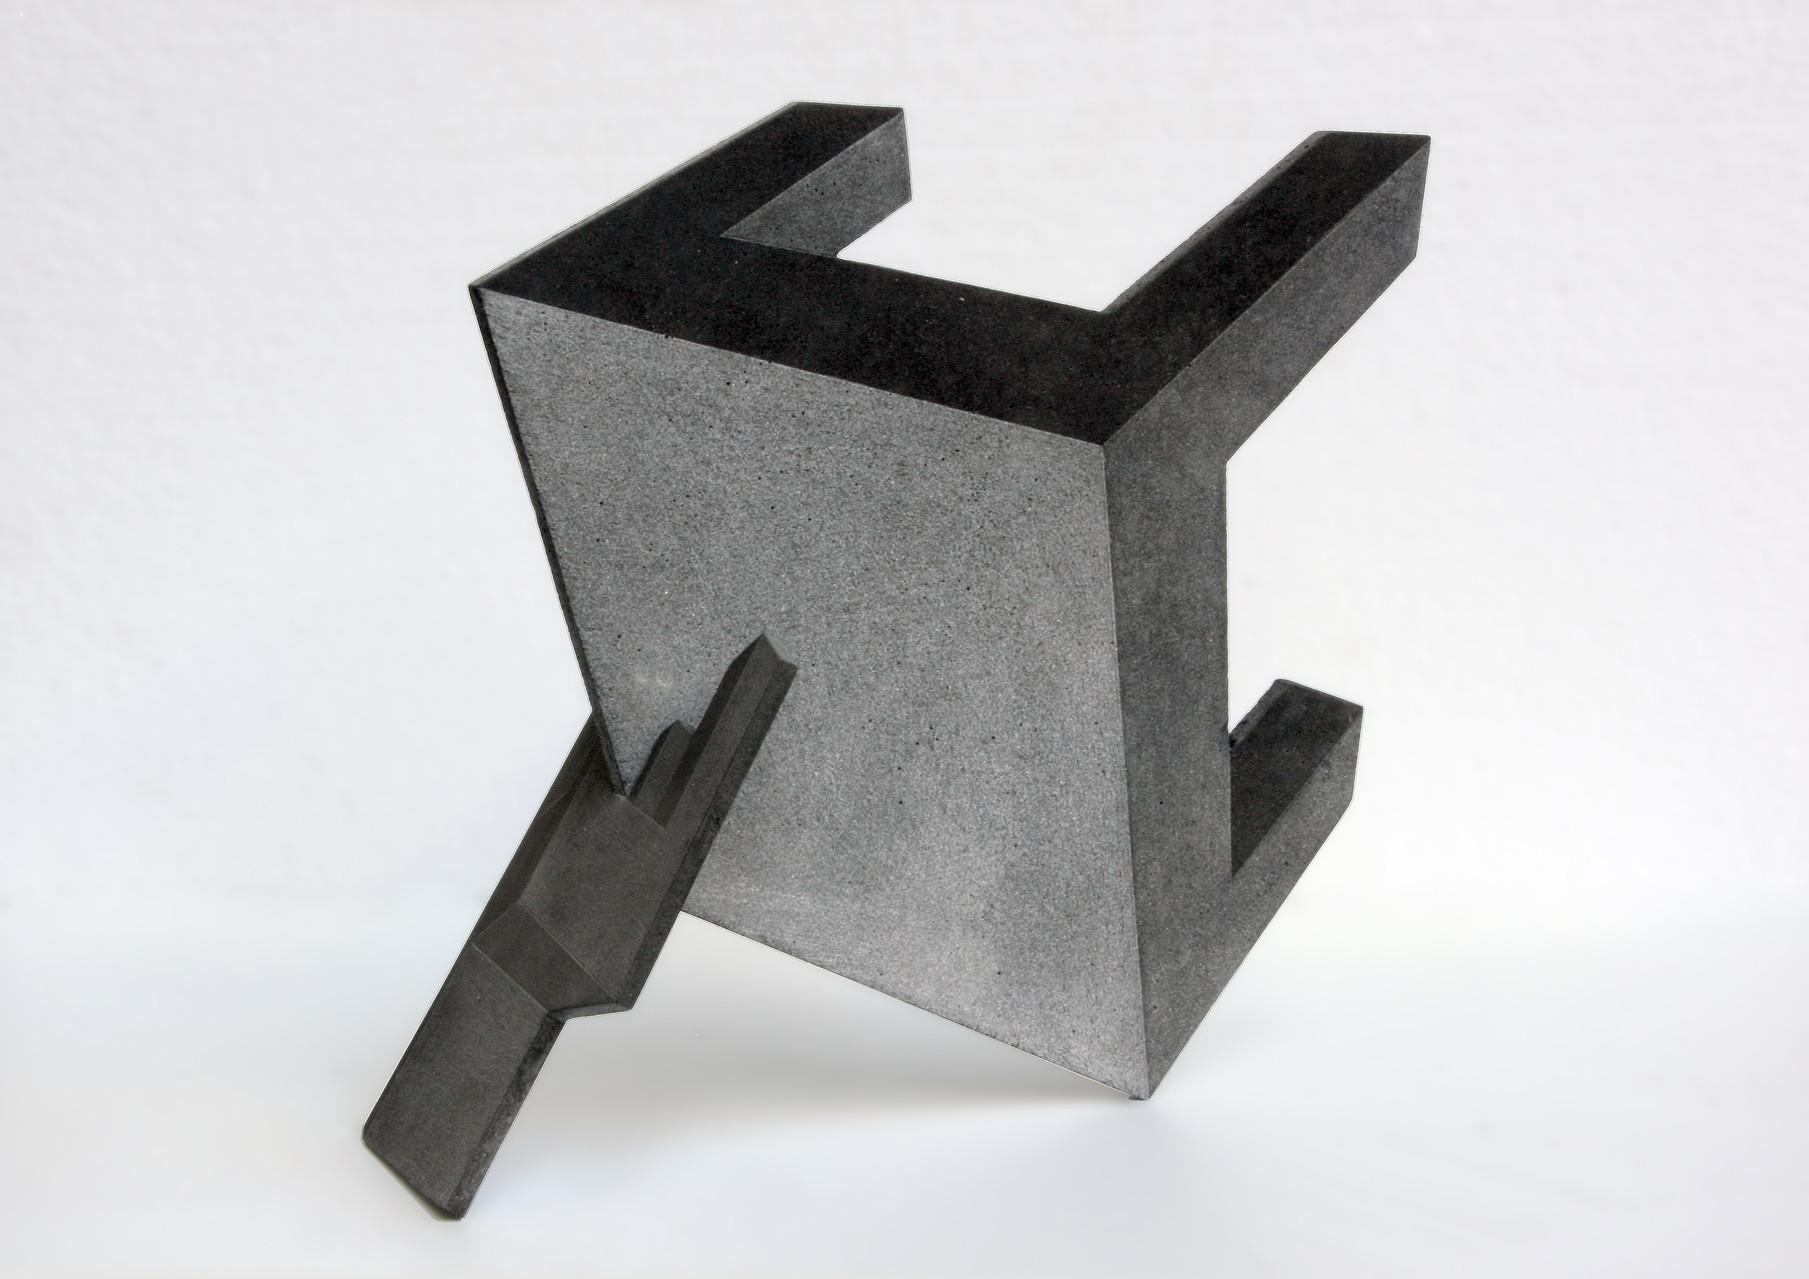 """Tisch + Stuhl, Beton / Gravur, 46 x 46 x 20, 2010"